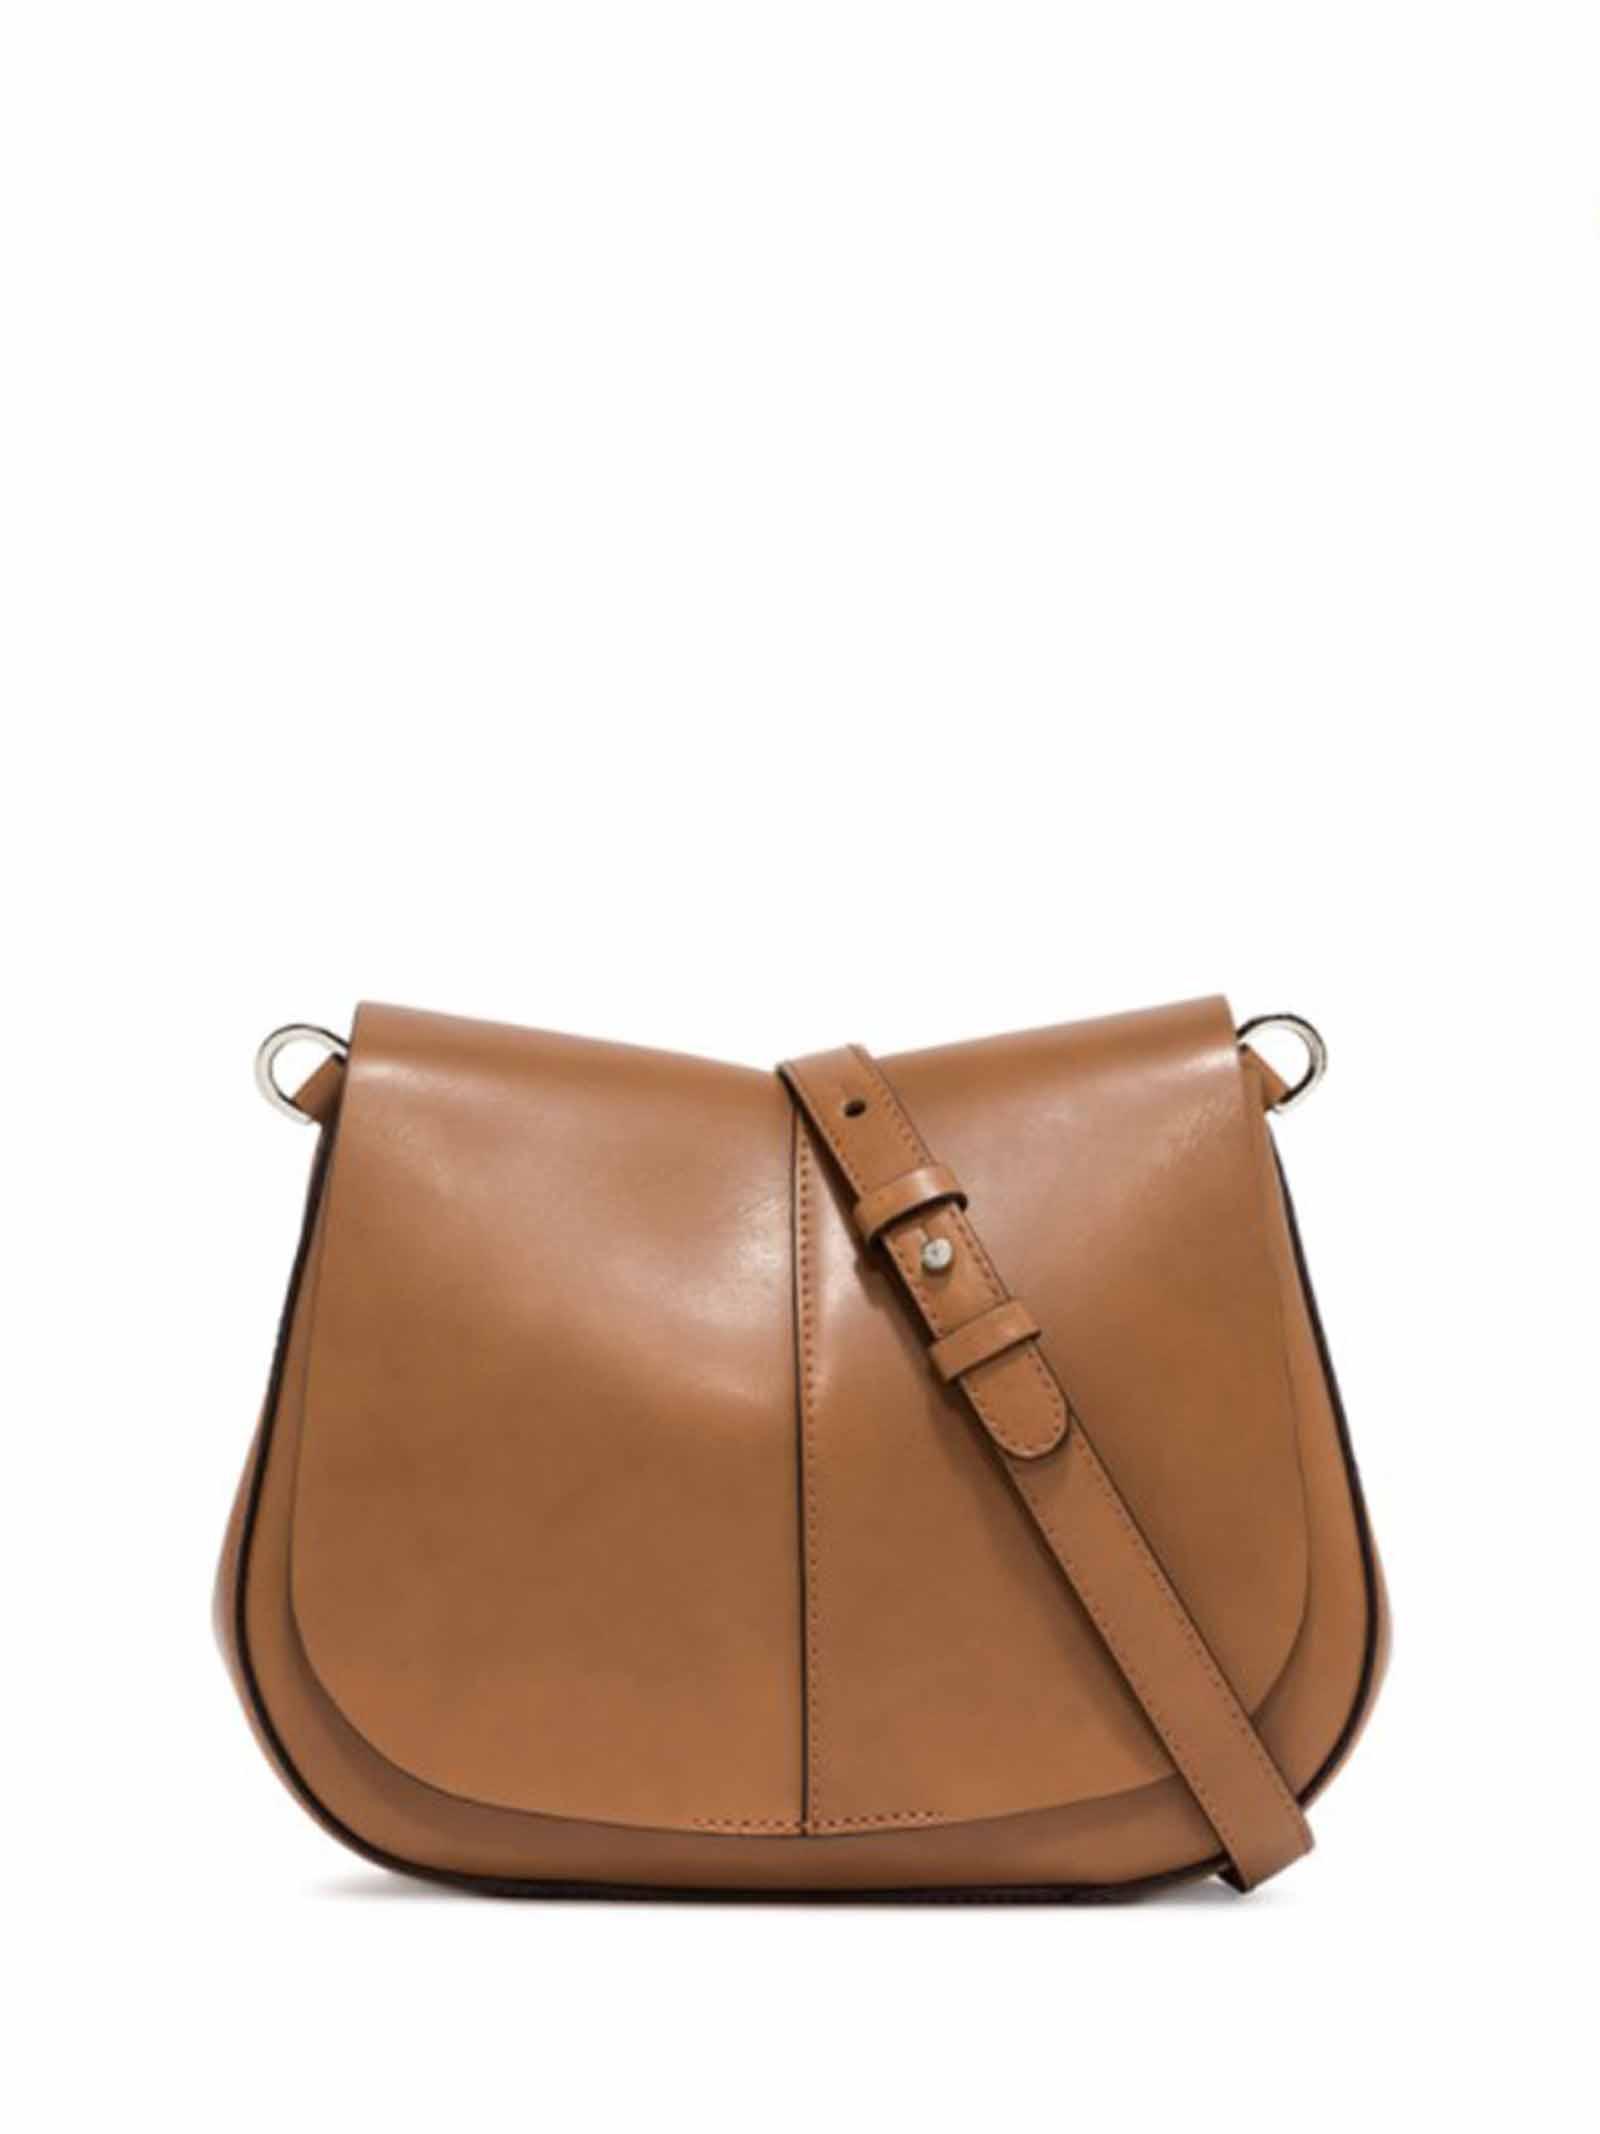 Gianni Chiarini | Bags and backpacks | BS6766206